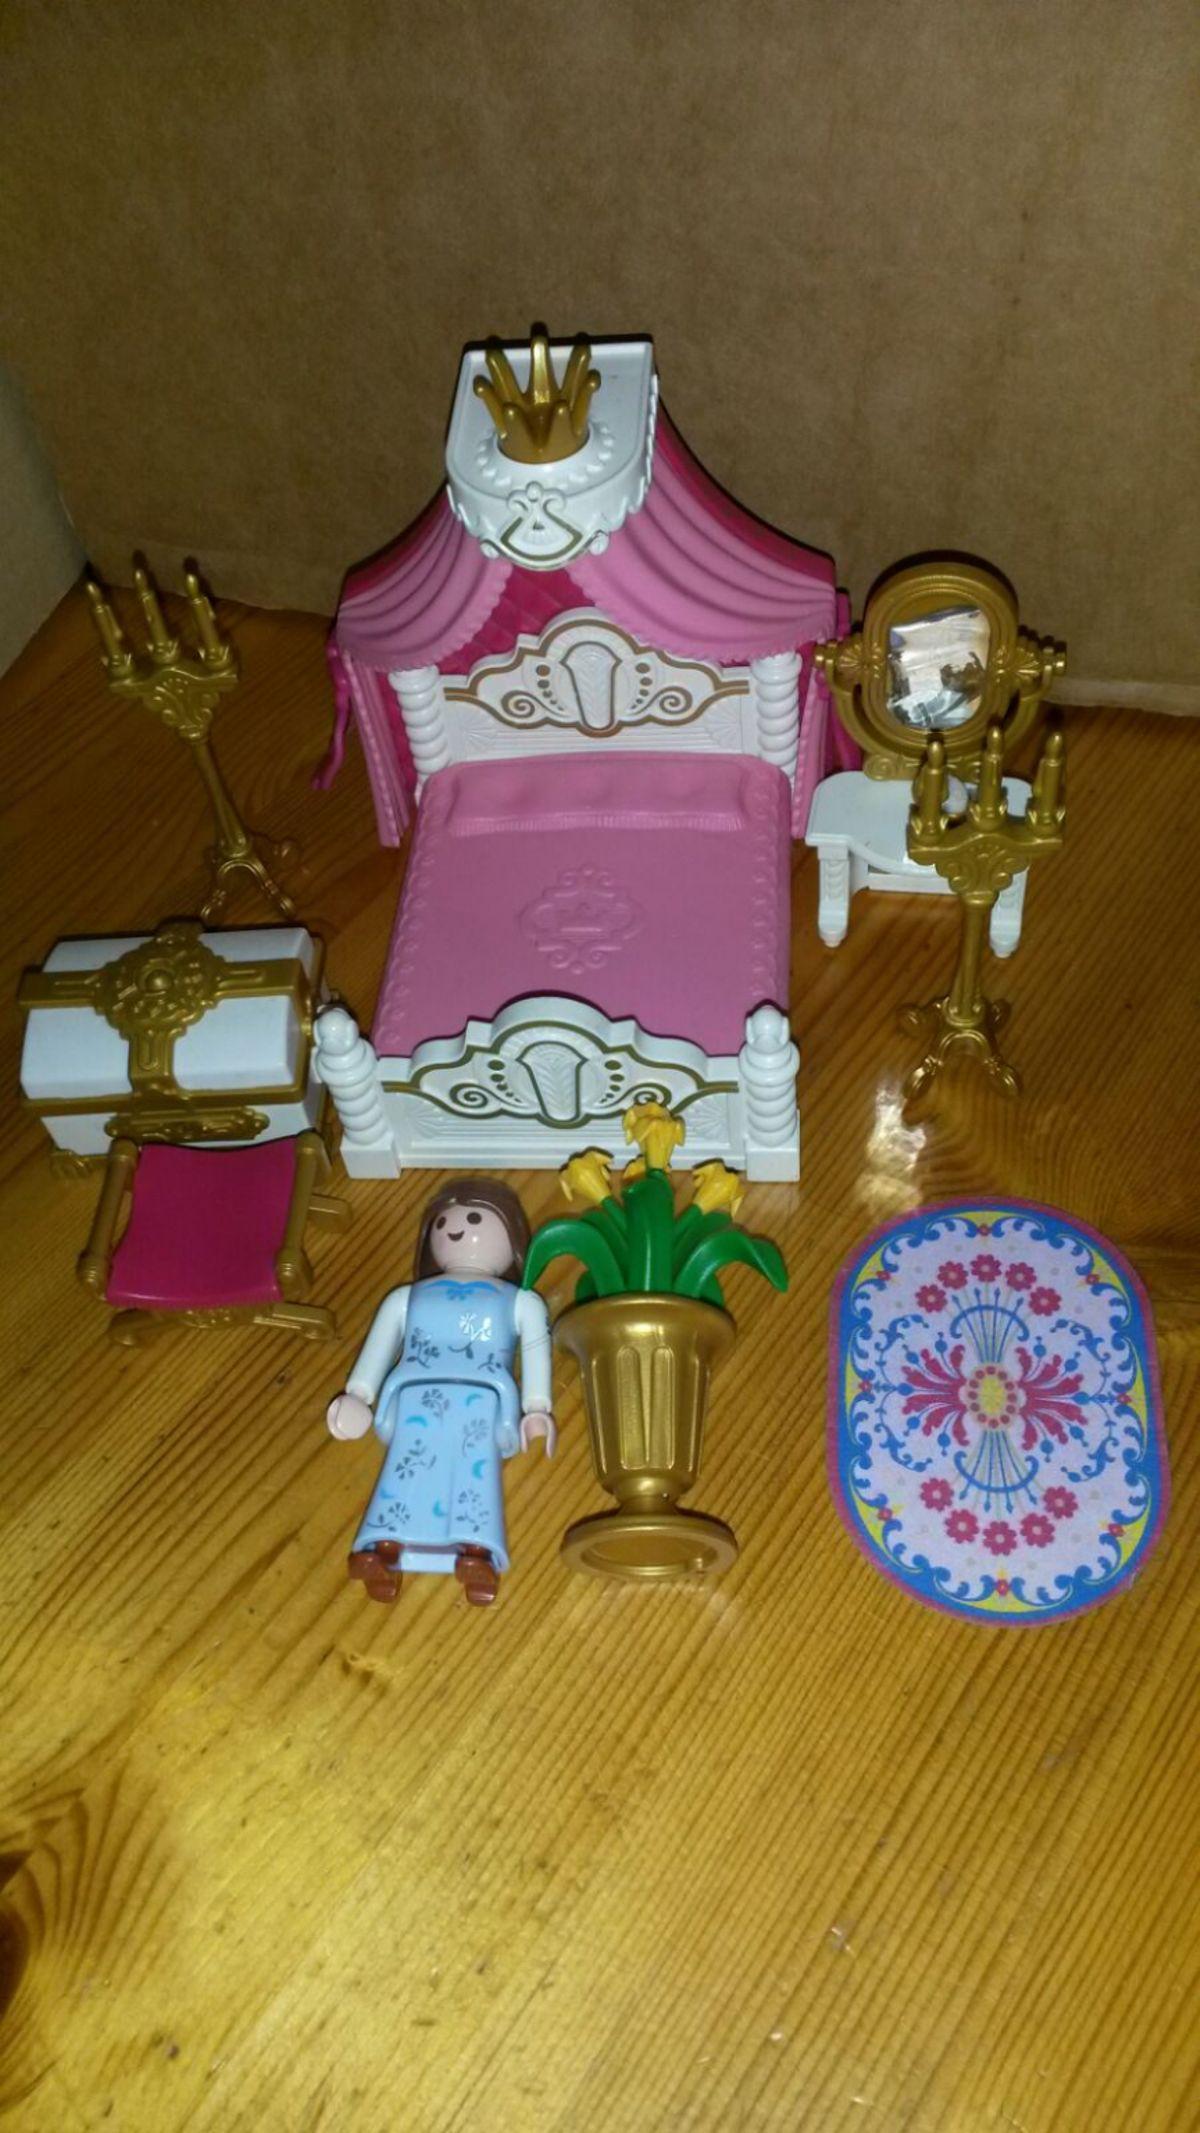 Himmelbett Playmobil Schlafzimmer